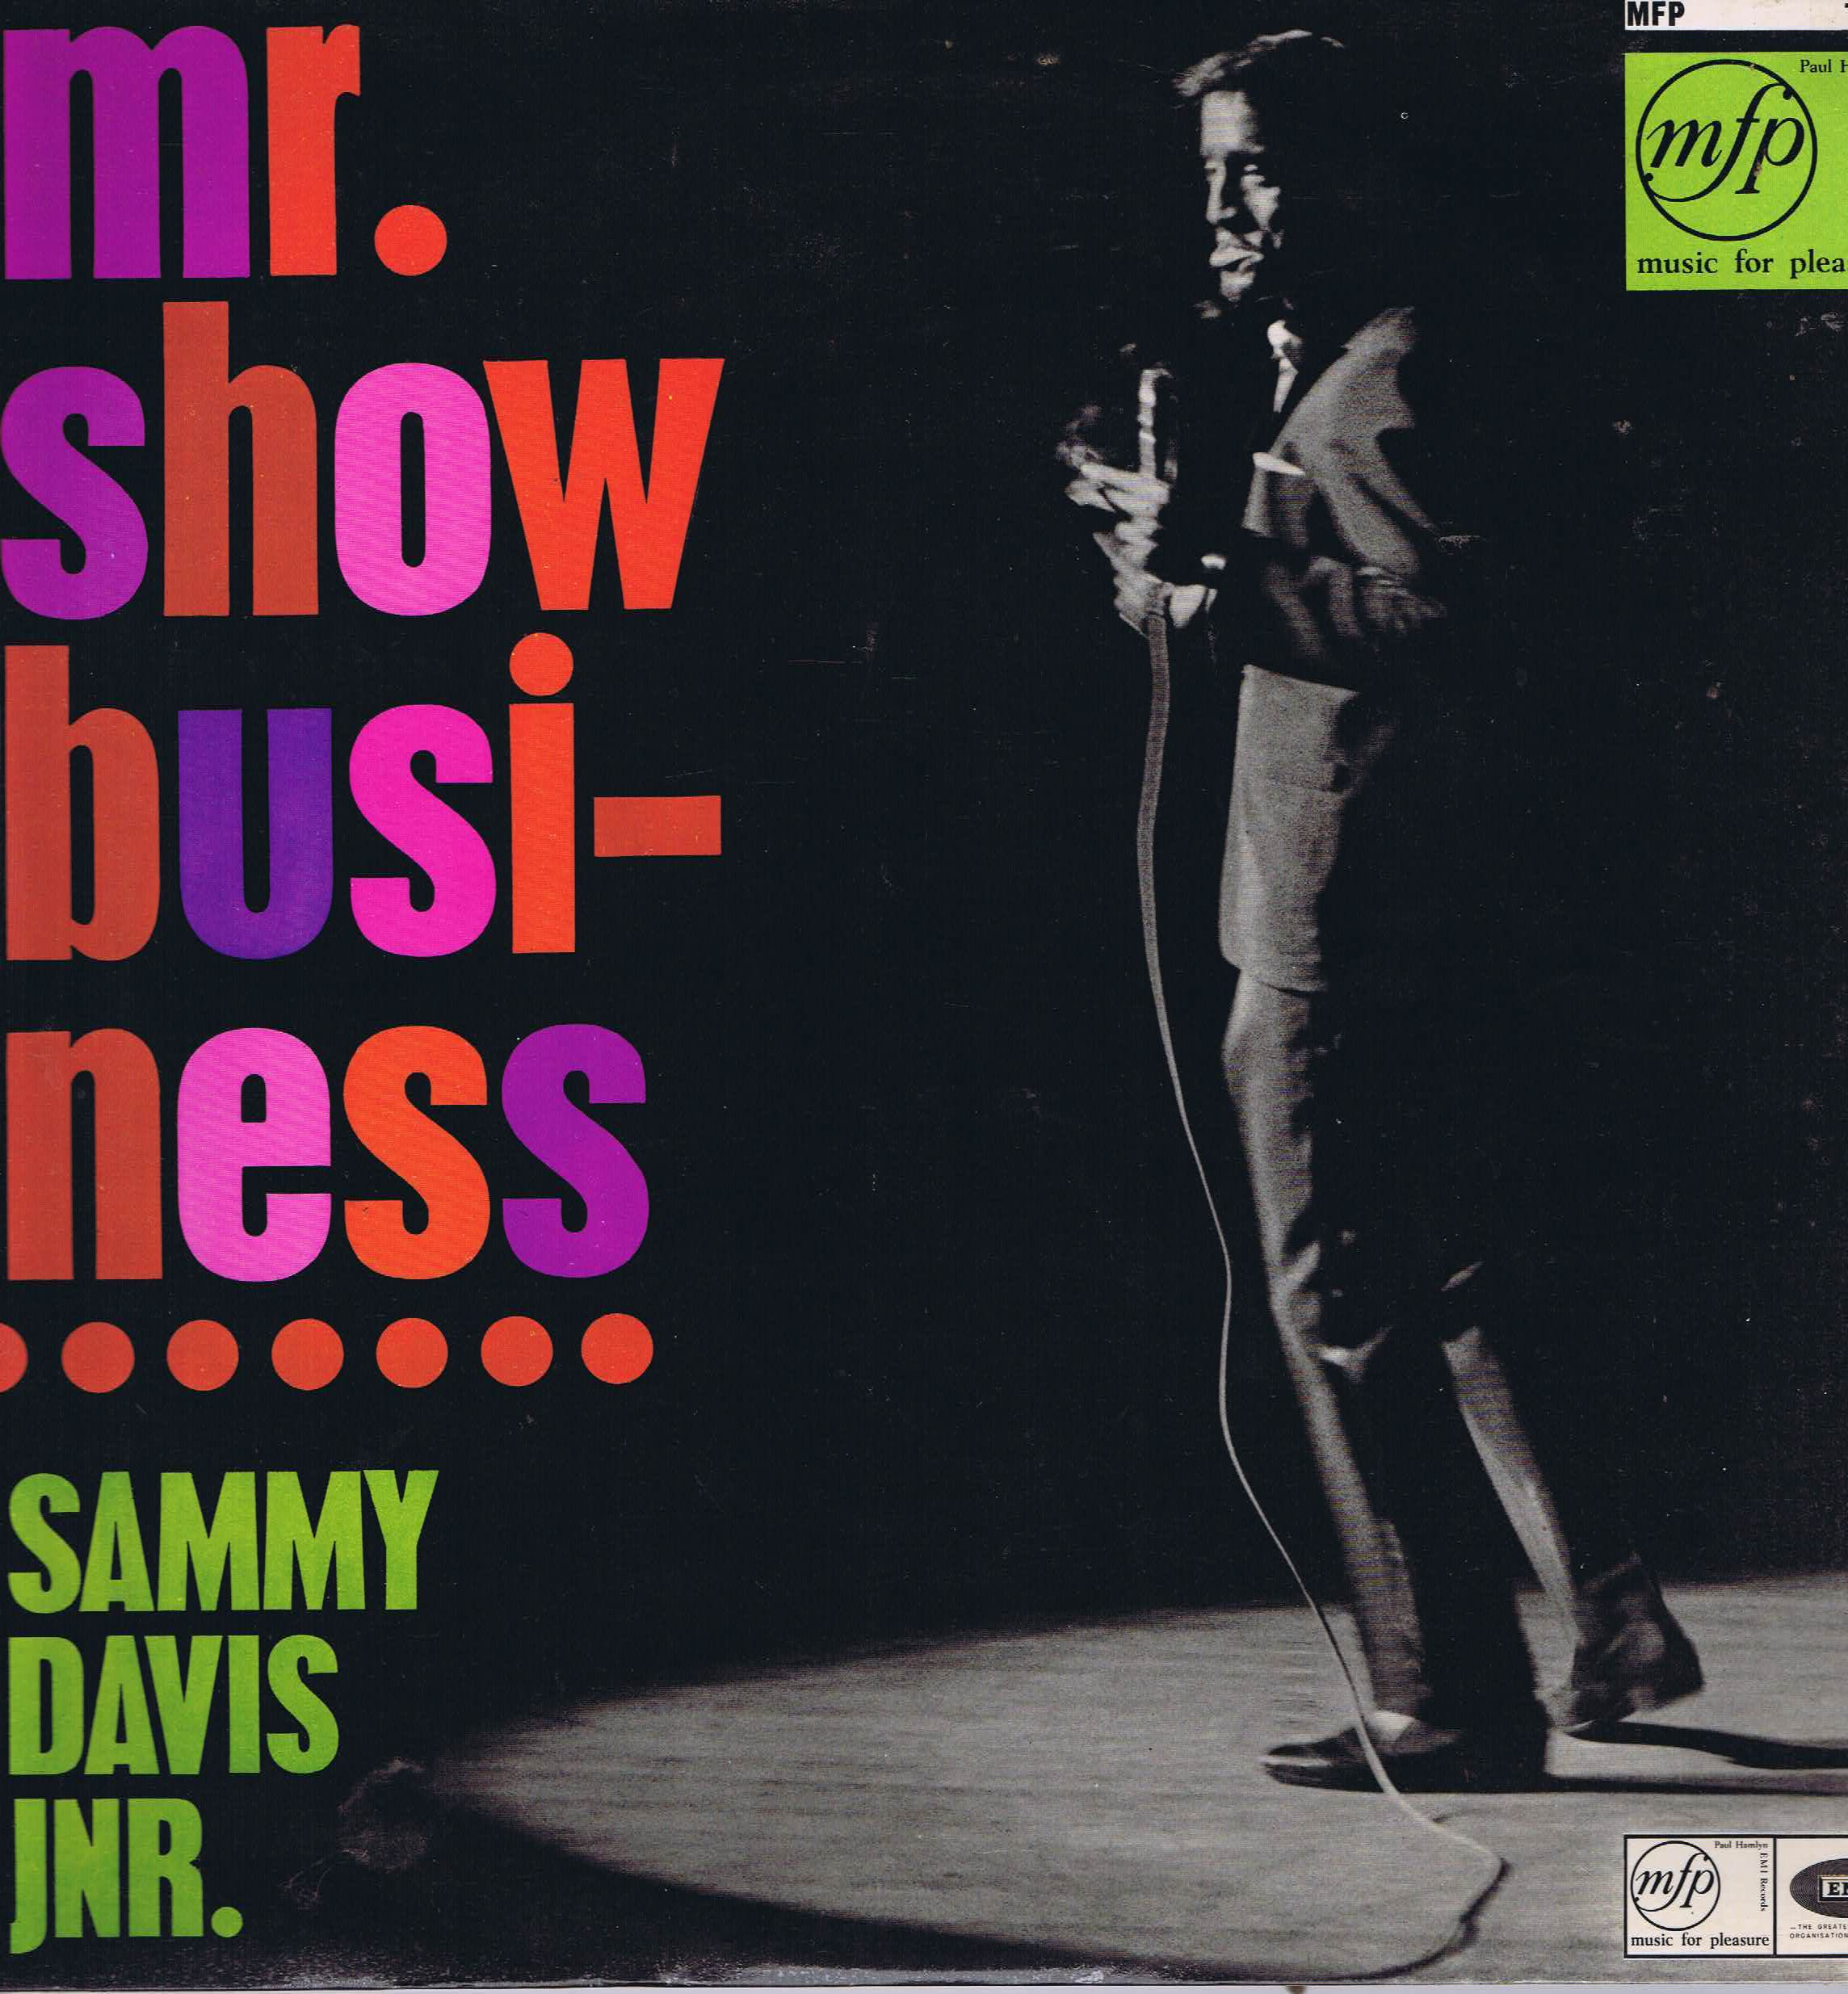 Sammy Davis Jr. Mr Show-Business Vinyl